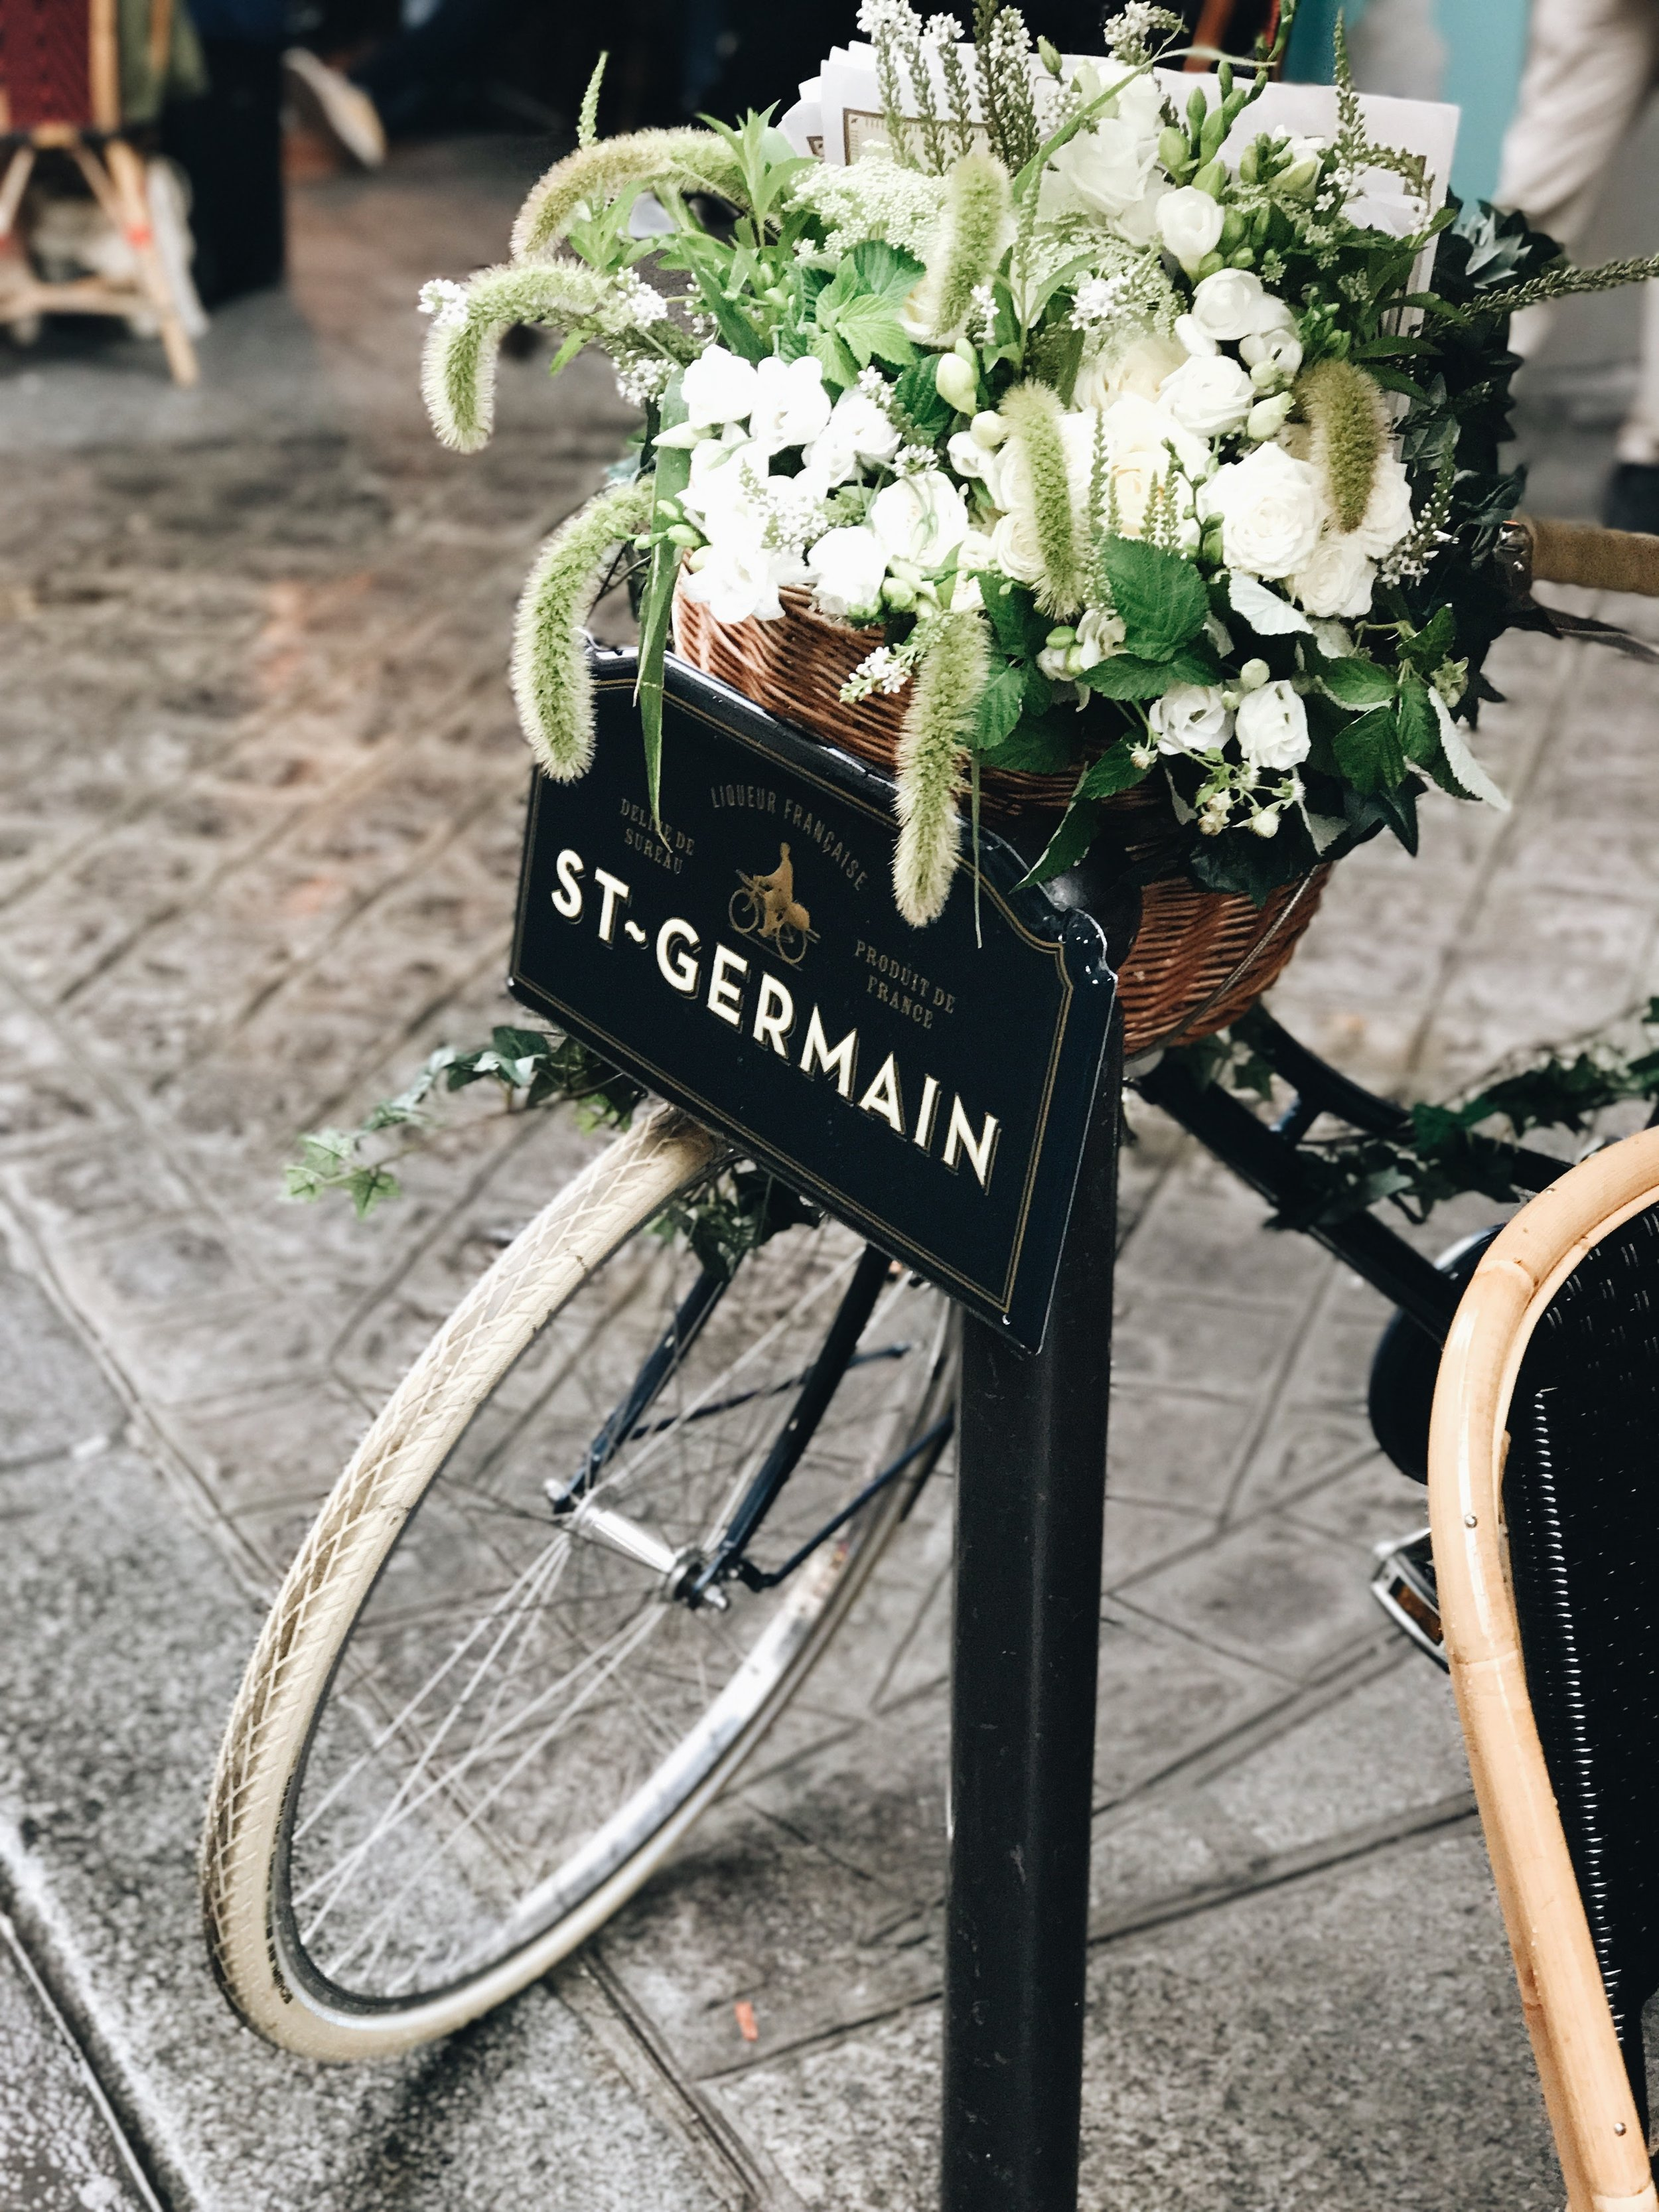 Bike with flowers in Paris